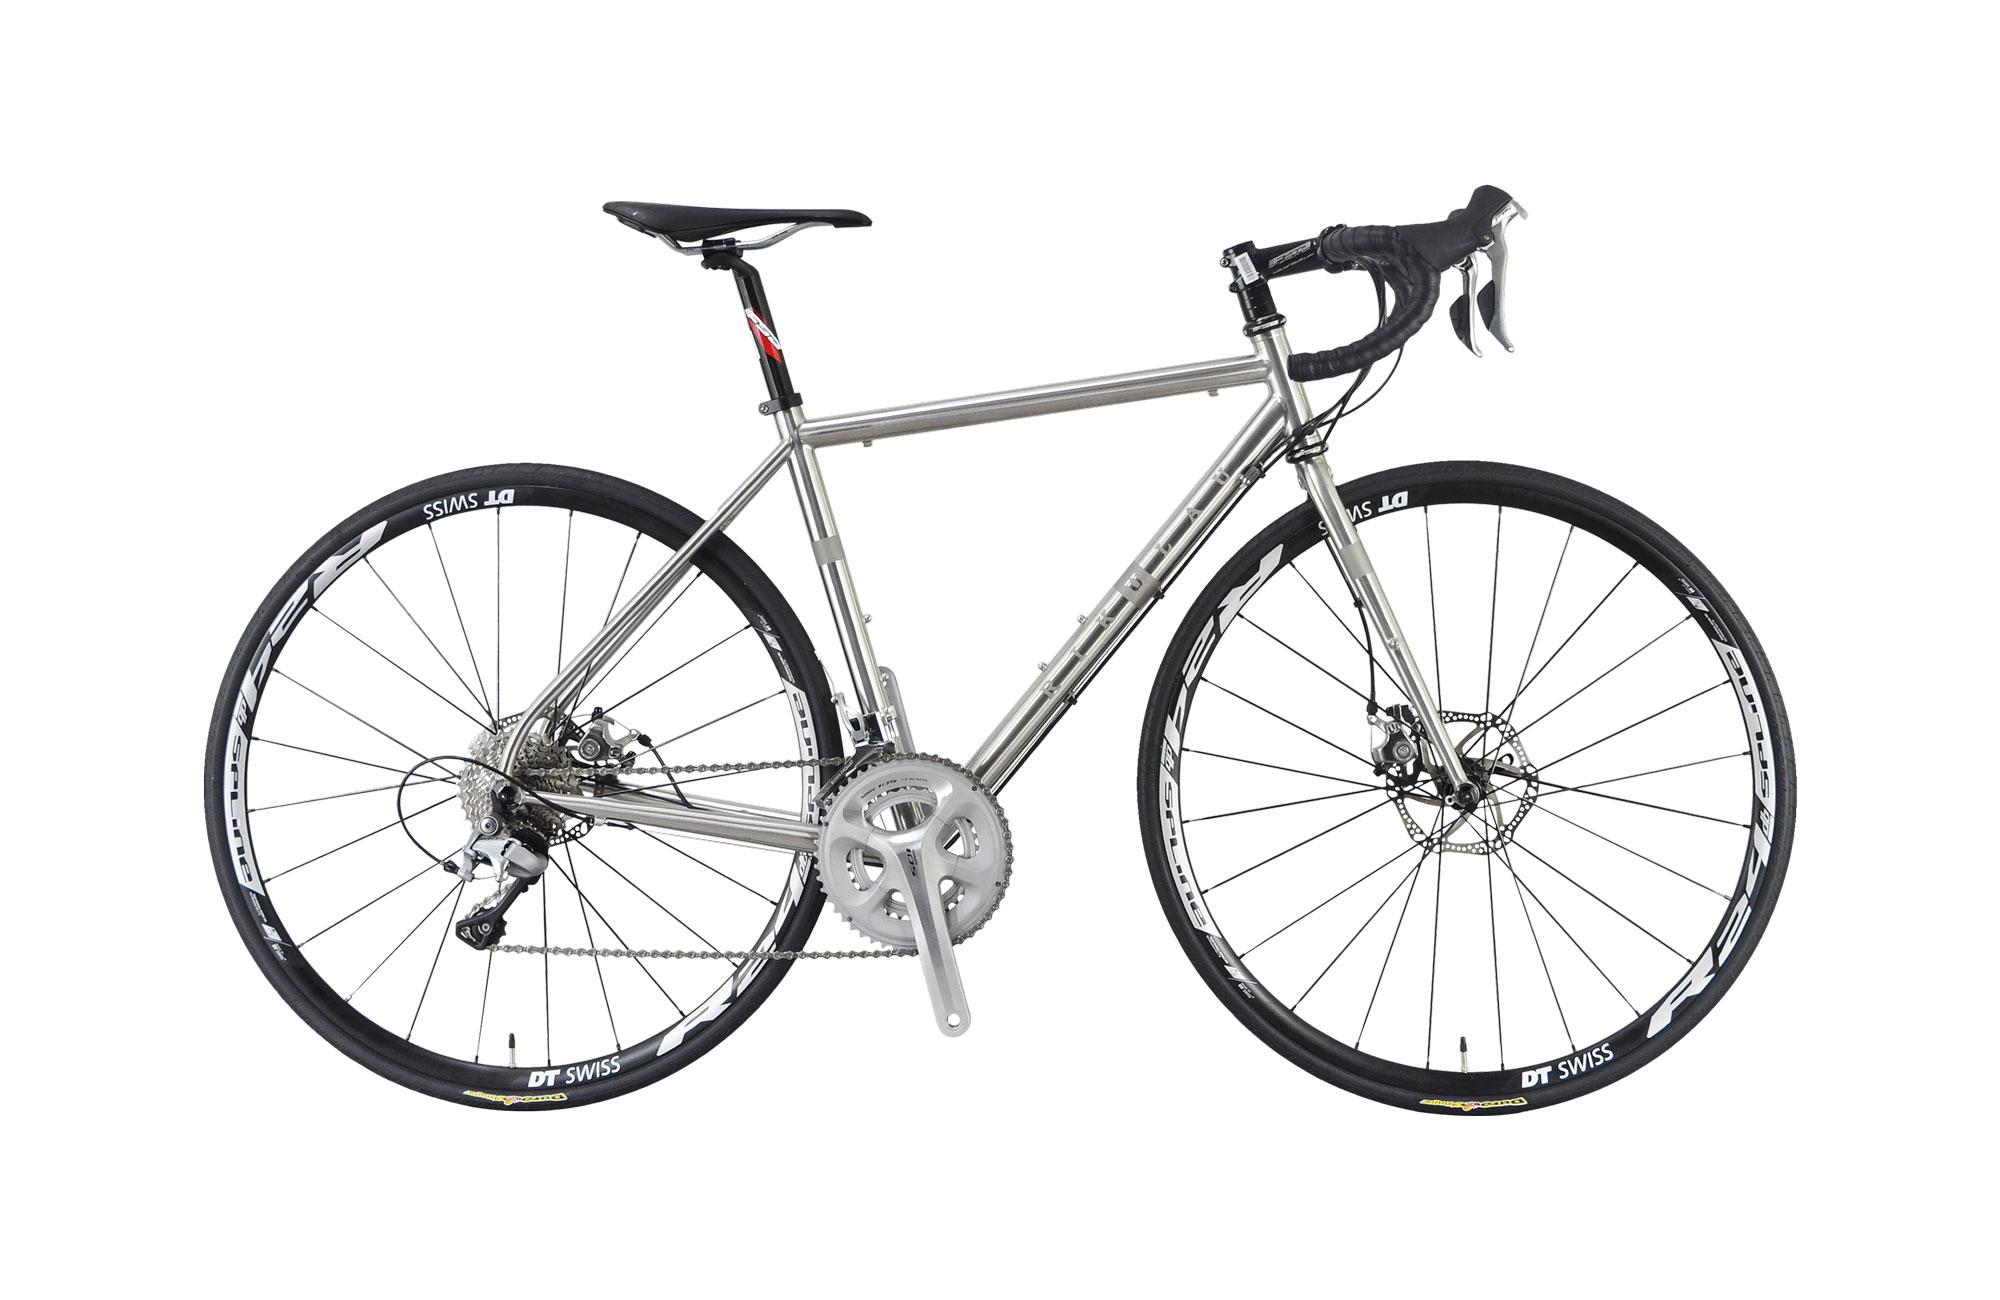 Road Bike - Audax M3 (stainless steel)